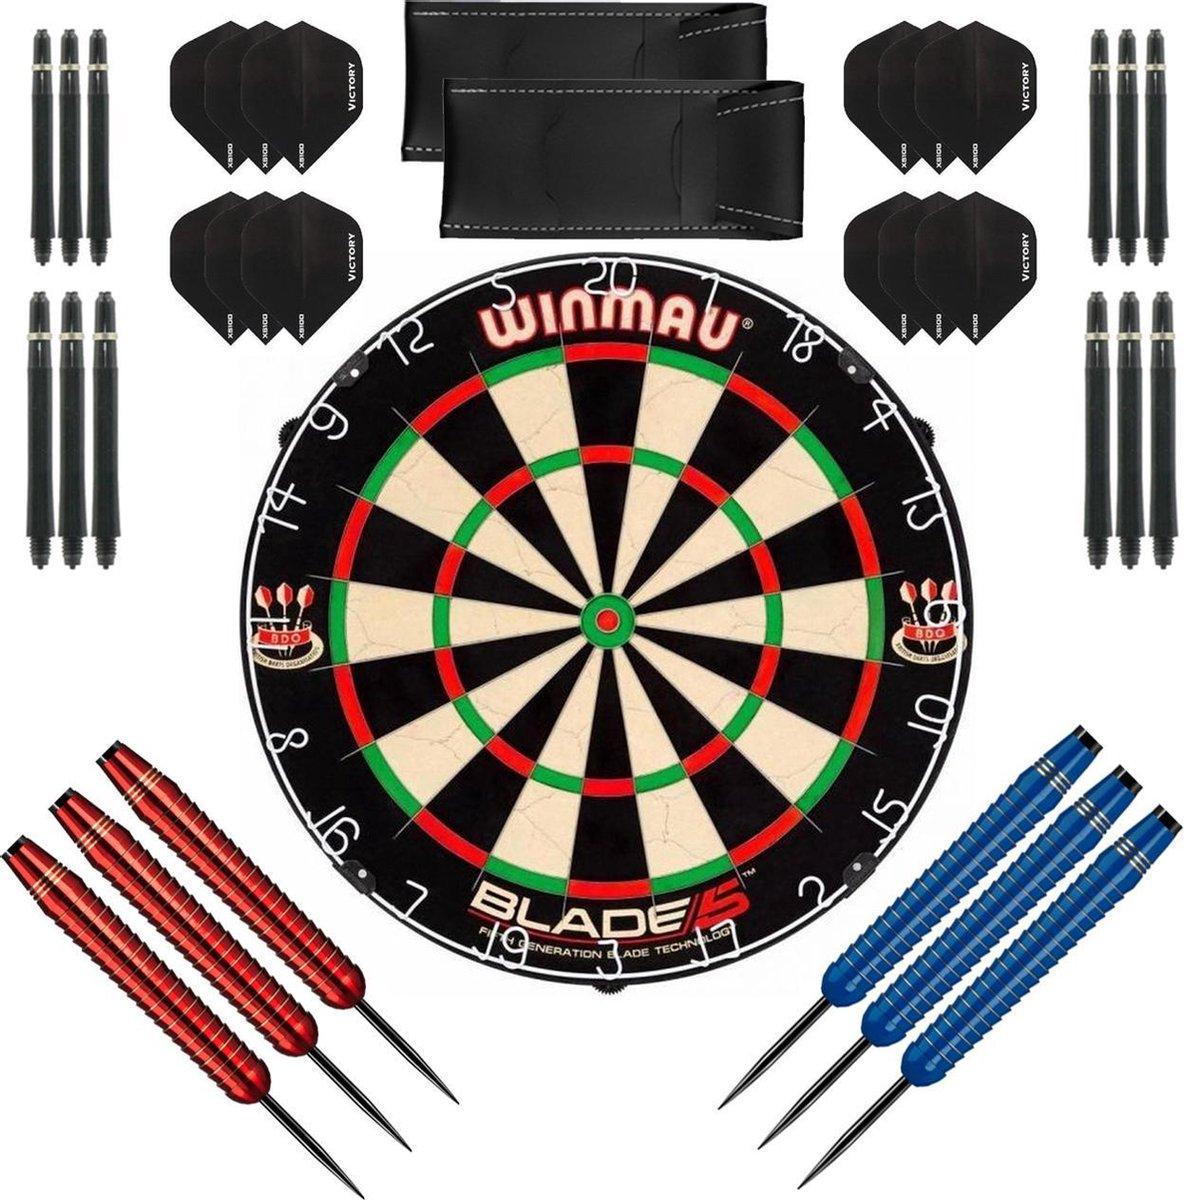 Dragon Darts complete Shark dartset - Winmau blade 5 - dartbord - dart shafts - dart flights - dartpijlen 24 gram - 100% brass - 2 sets - dartpijlen - rood-blauw